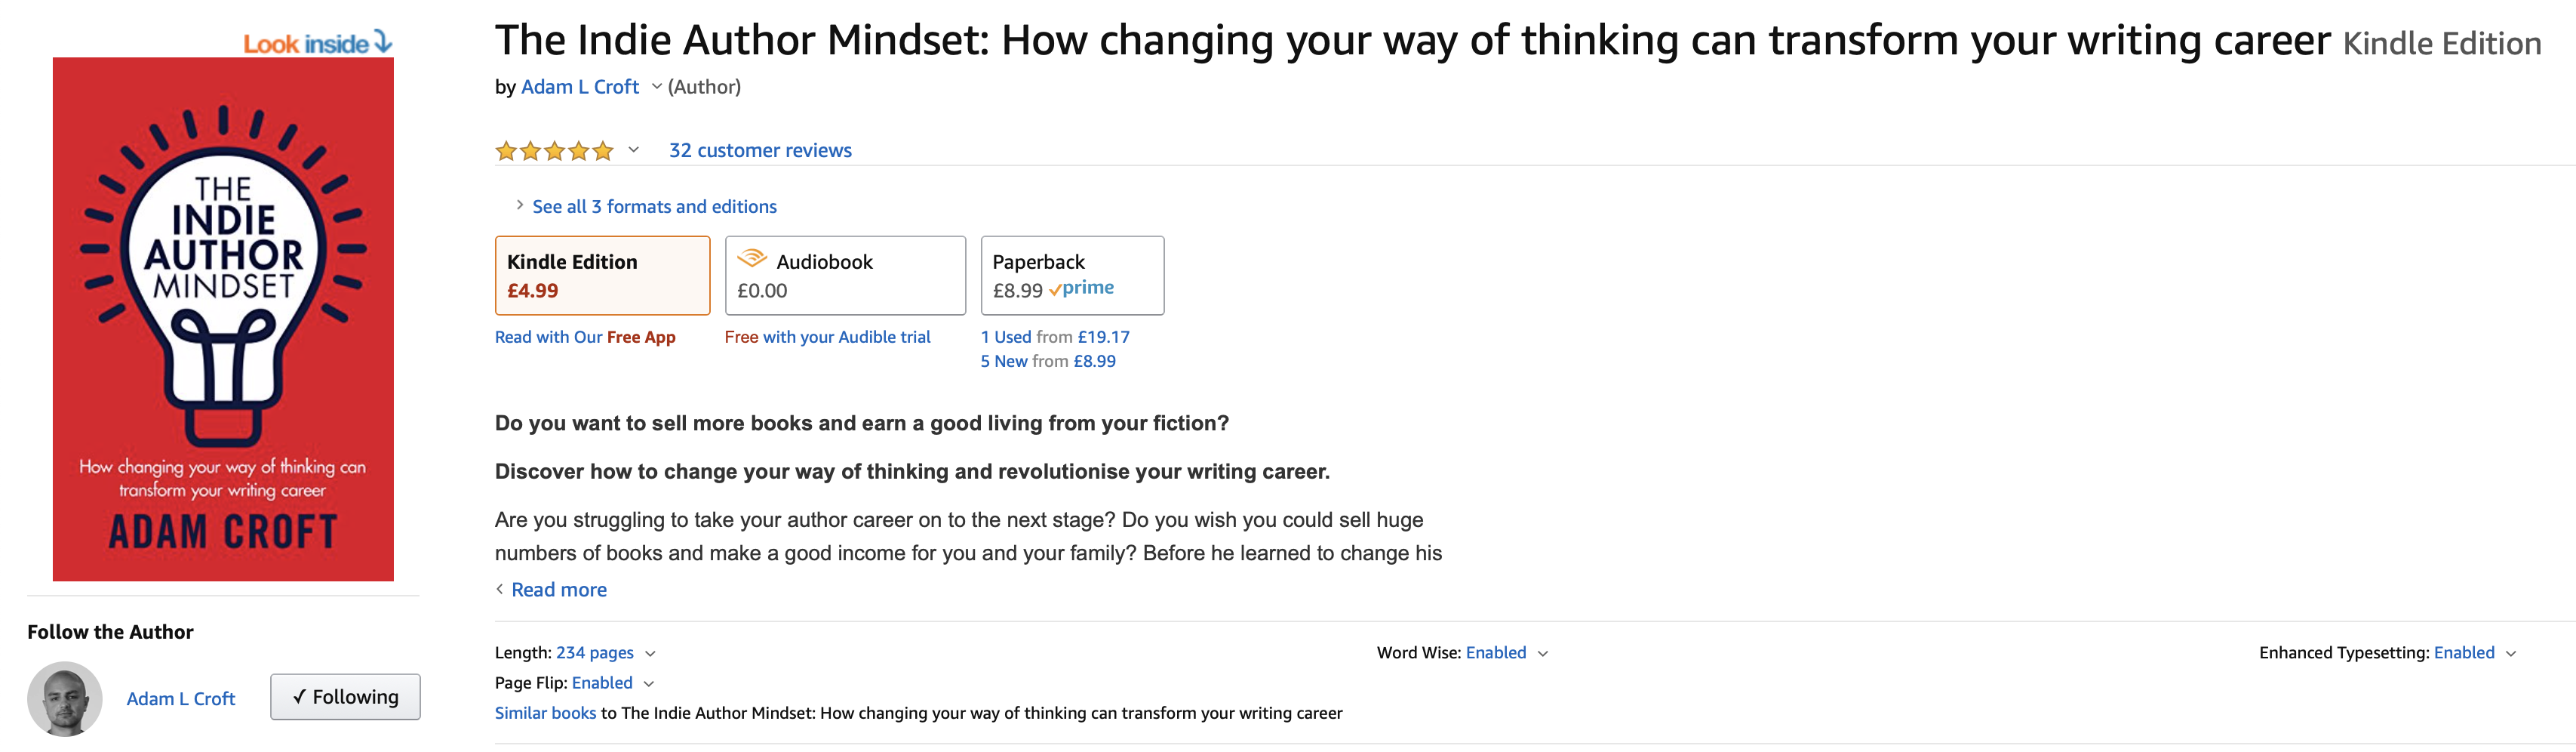 Adam Croft's The Indie Author Mindset Amazon listing